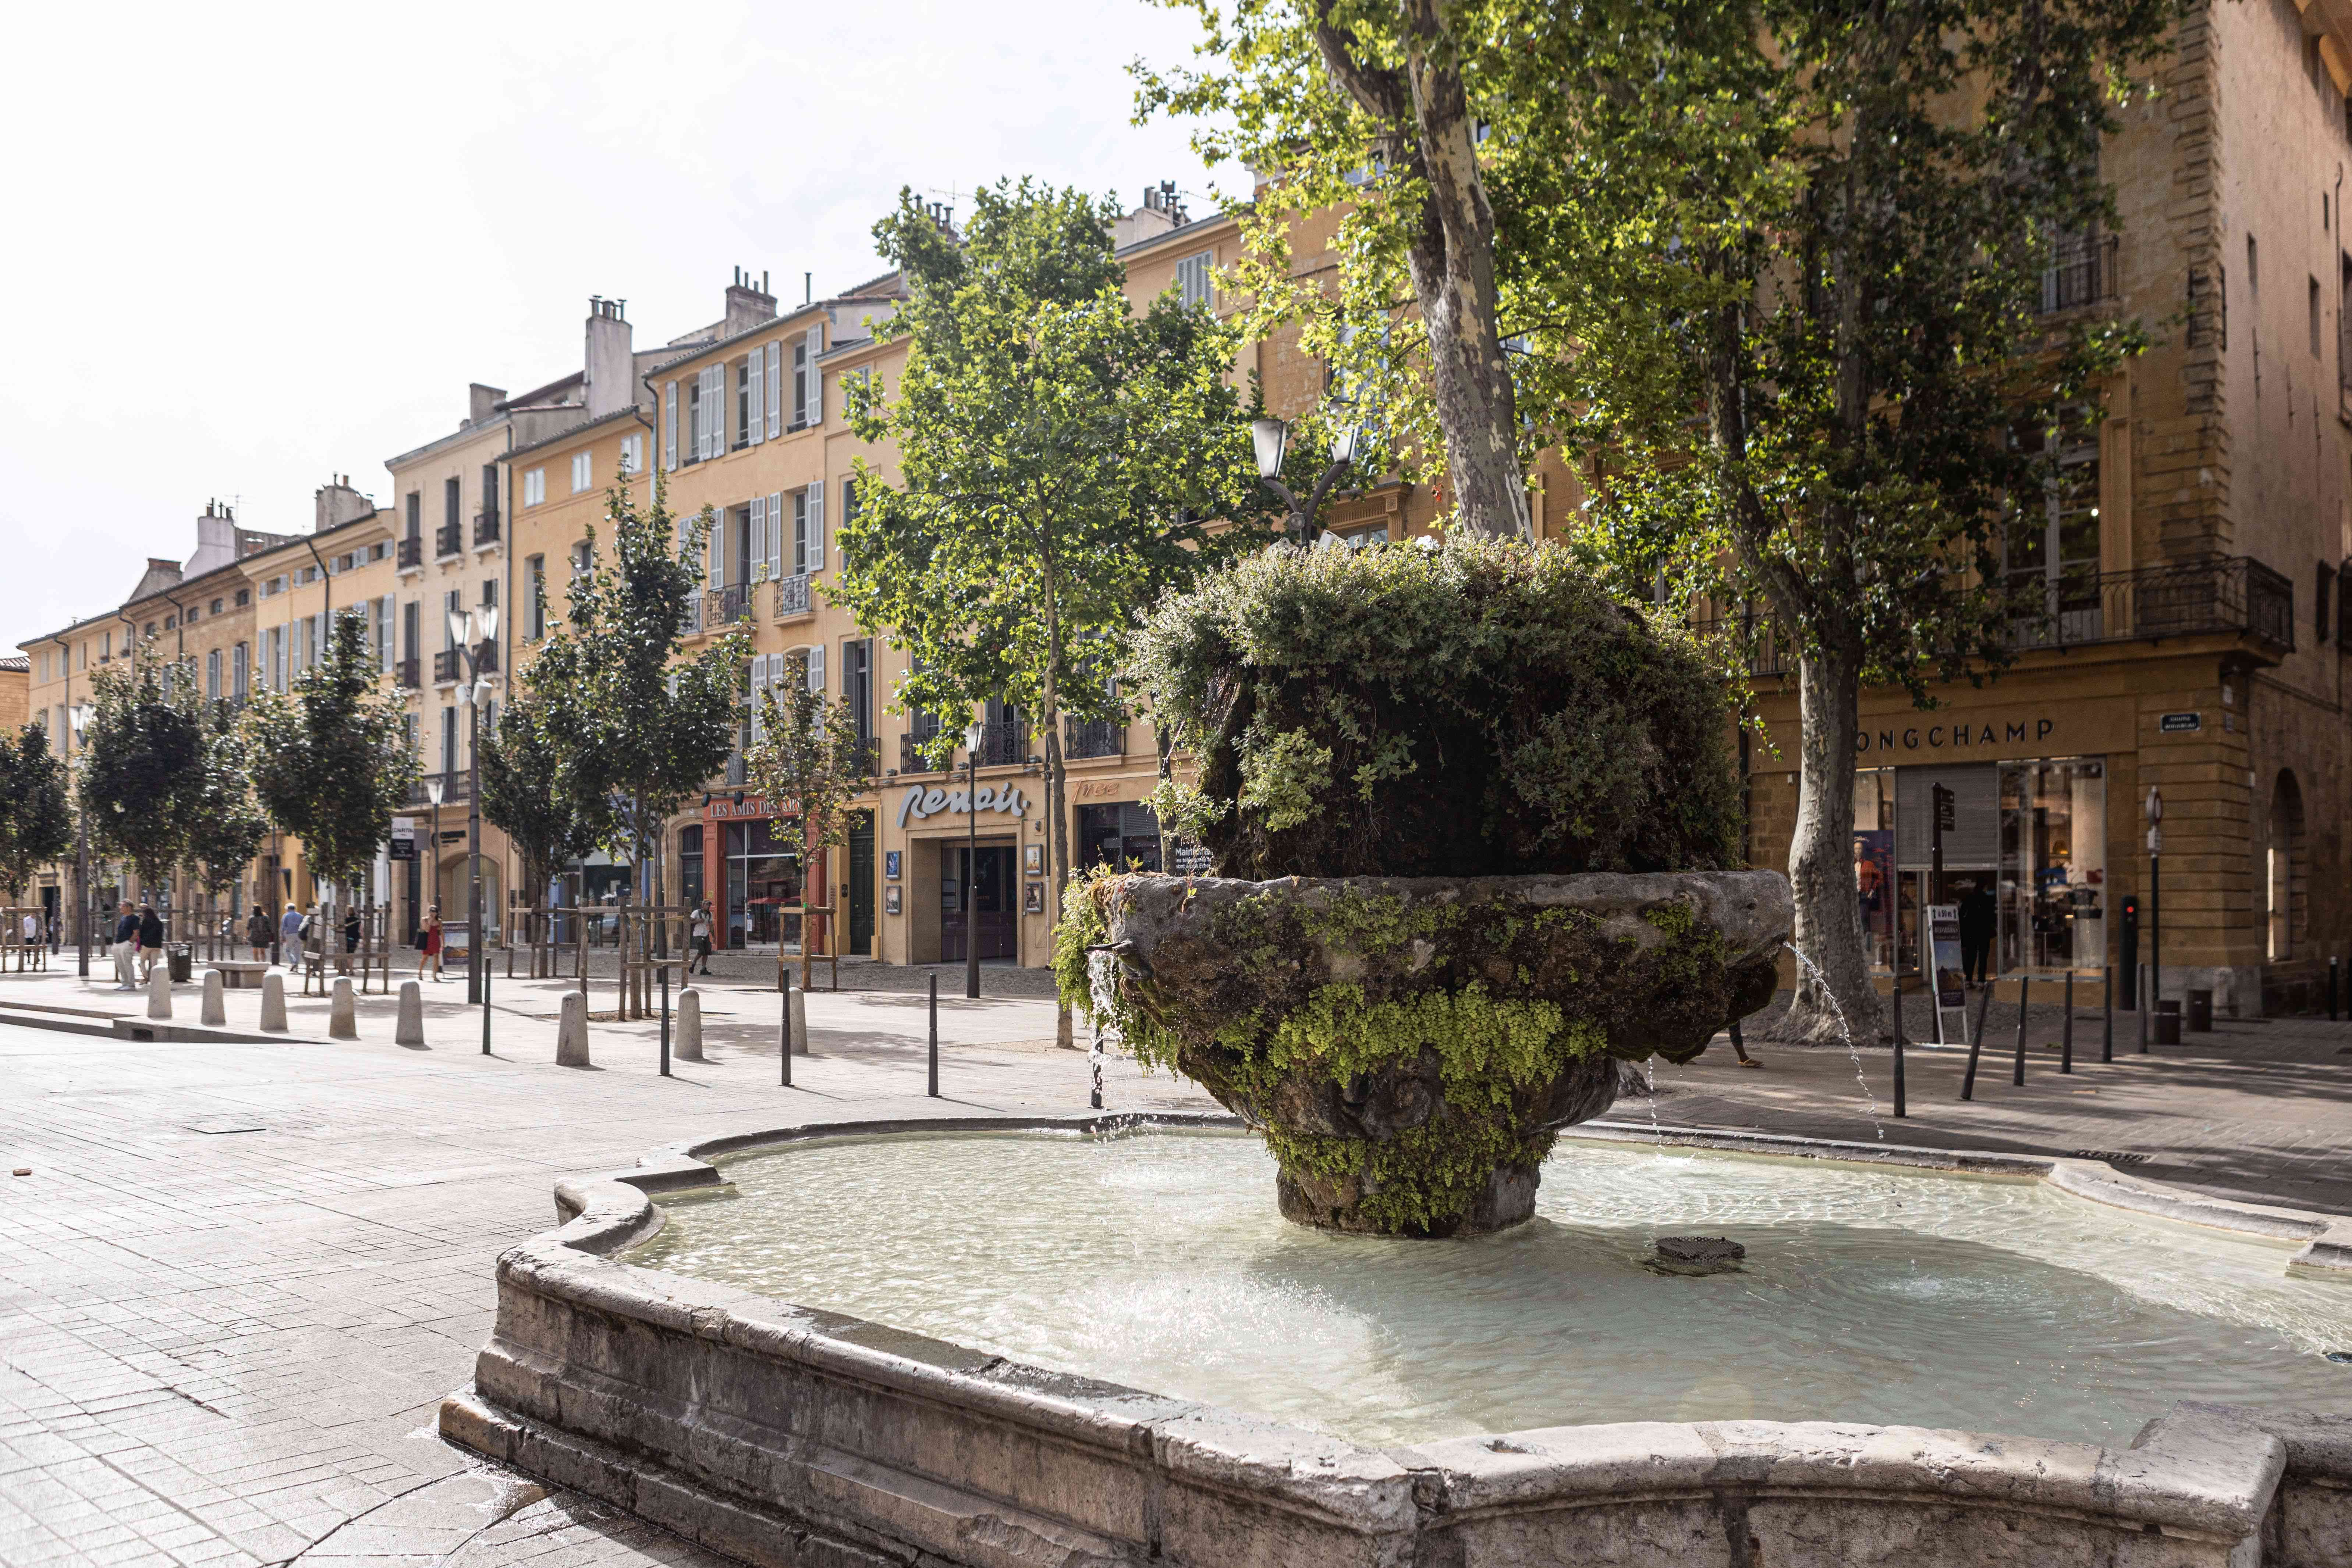 A public fountain in Aix-en-Provence